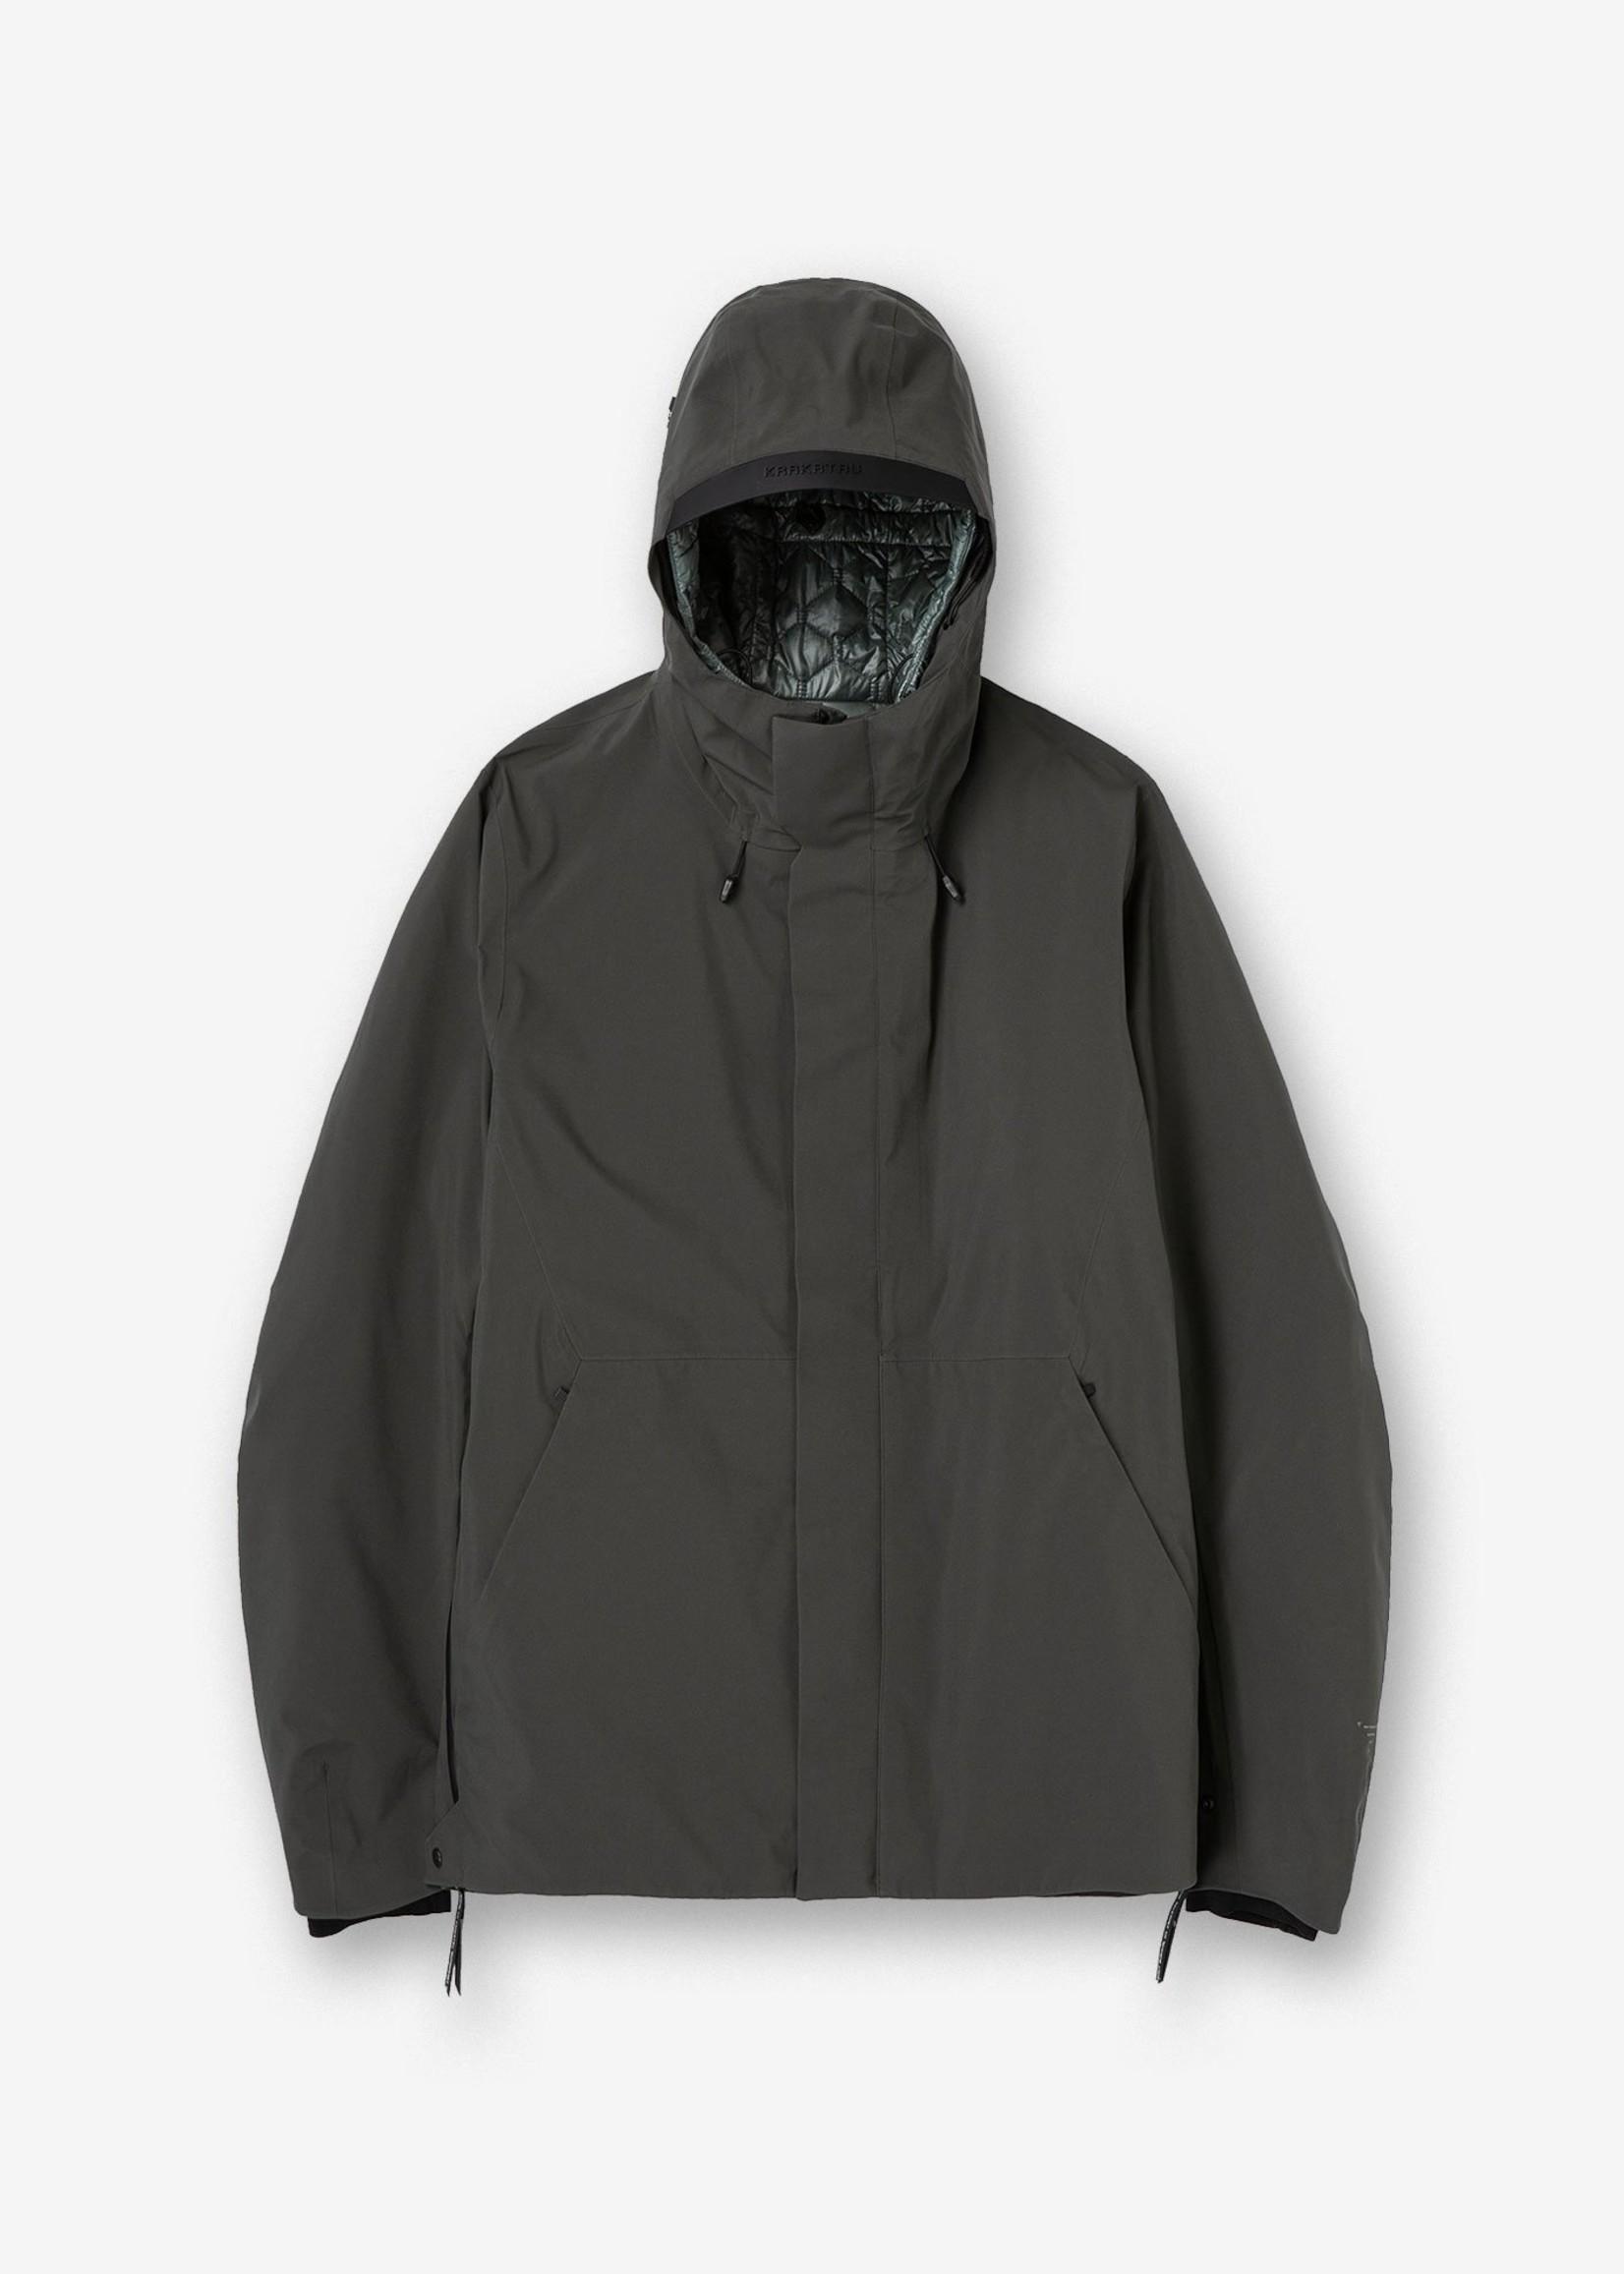 Krakatau QM299 Bicep Jacket